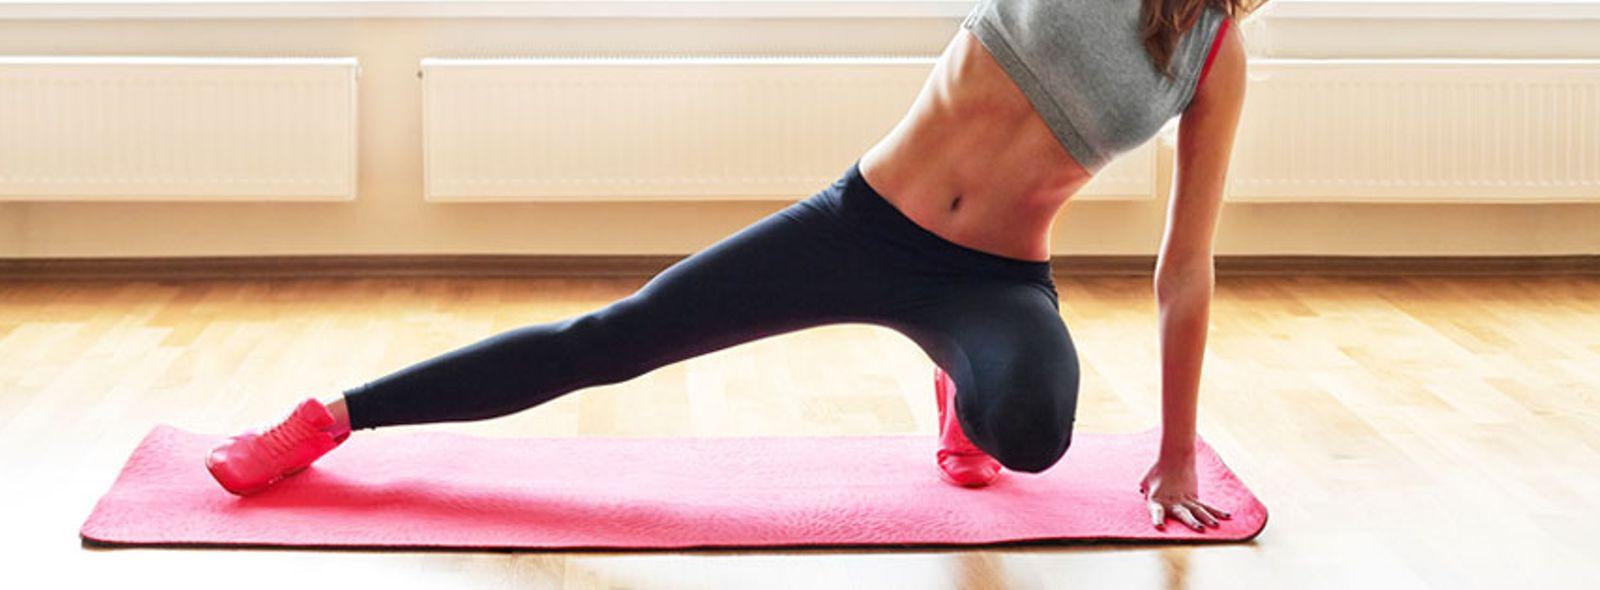 Migliori esercizi anticellulite per l'estate